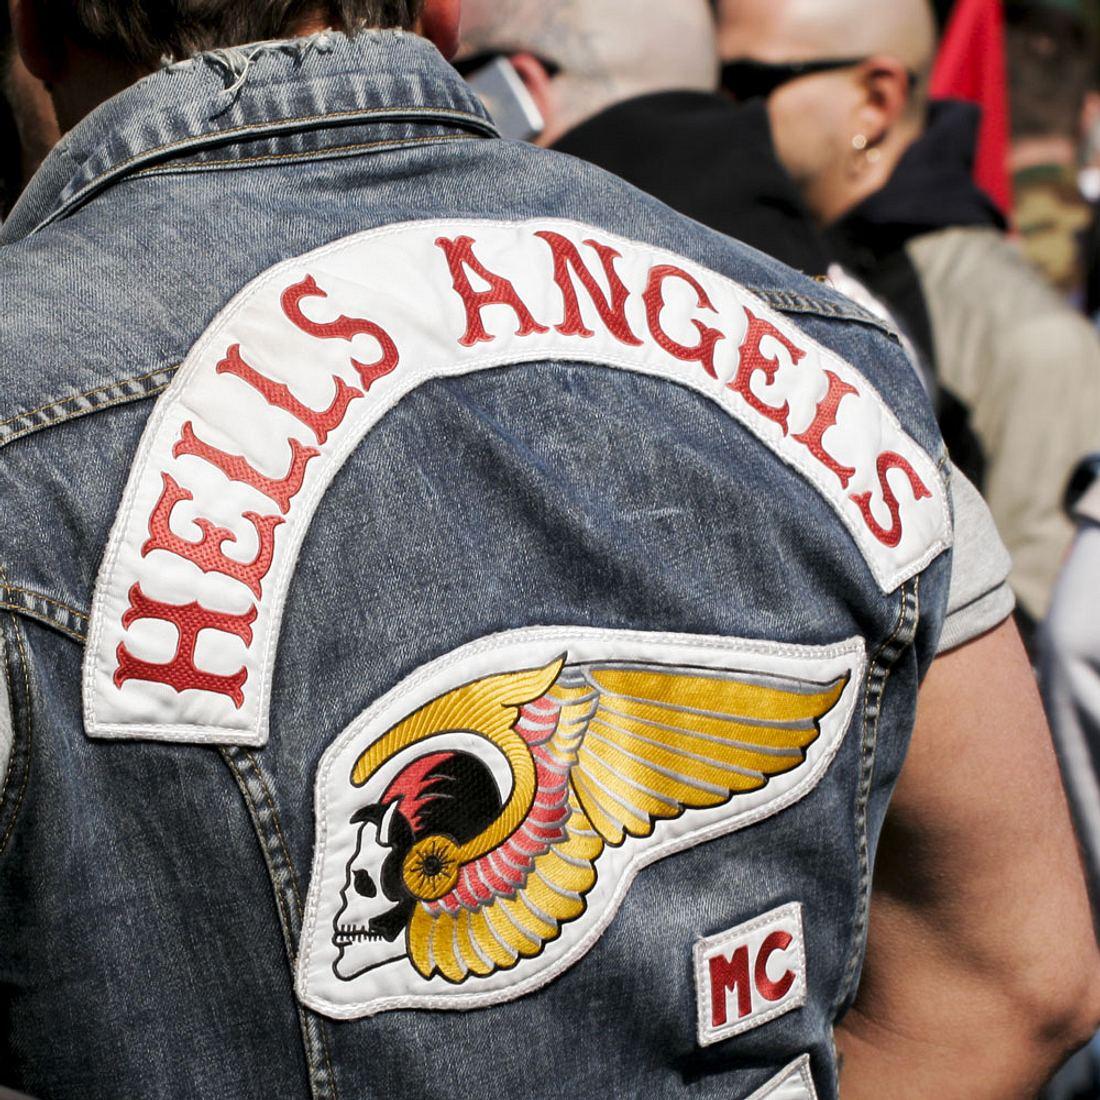 Hells Angels schmeißen Rocker-Boss raus!